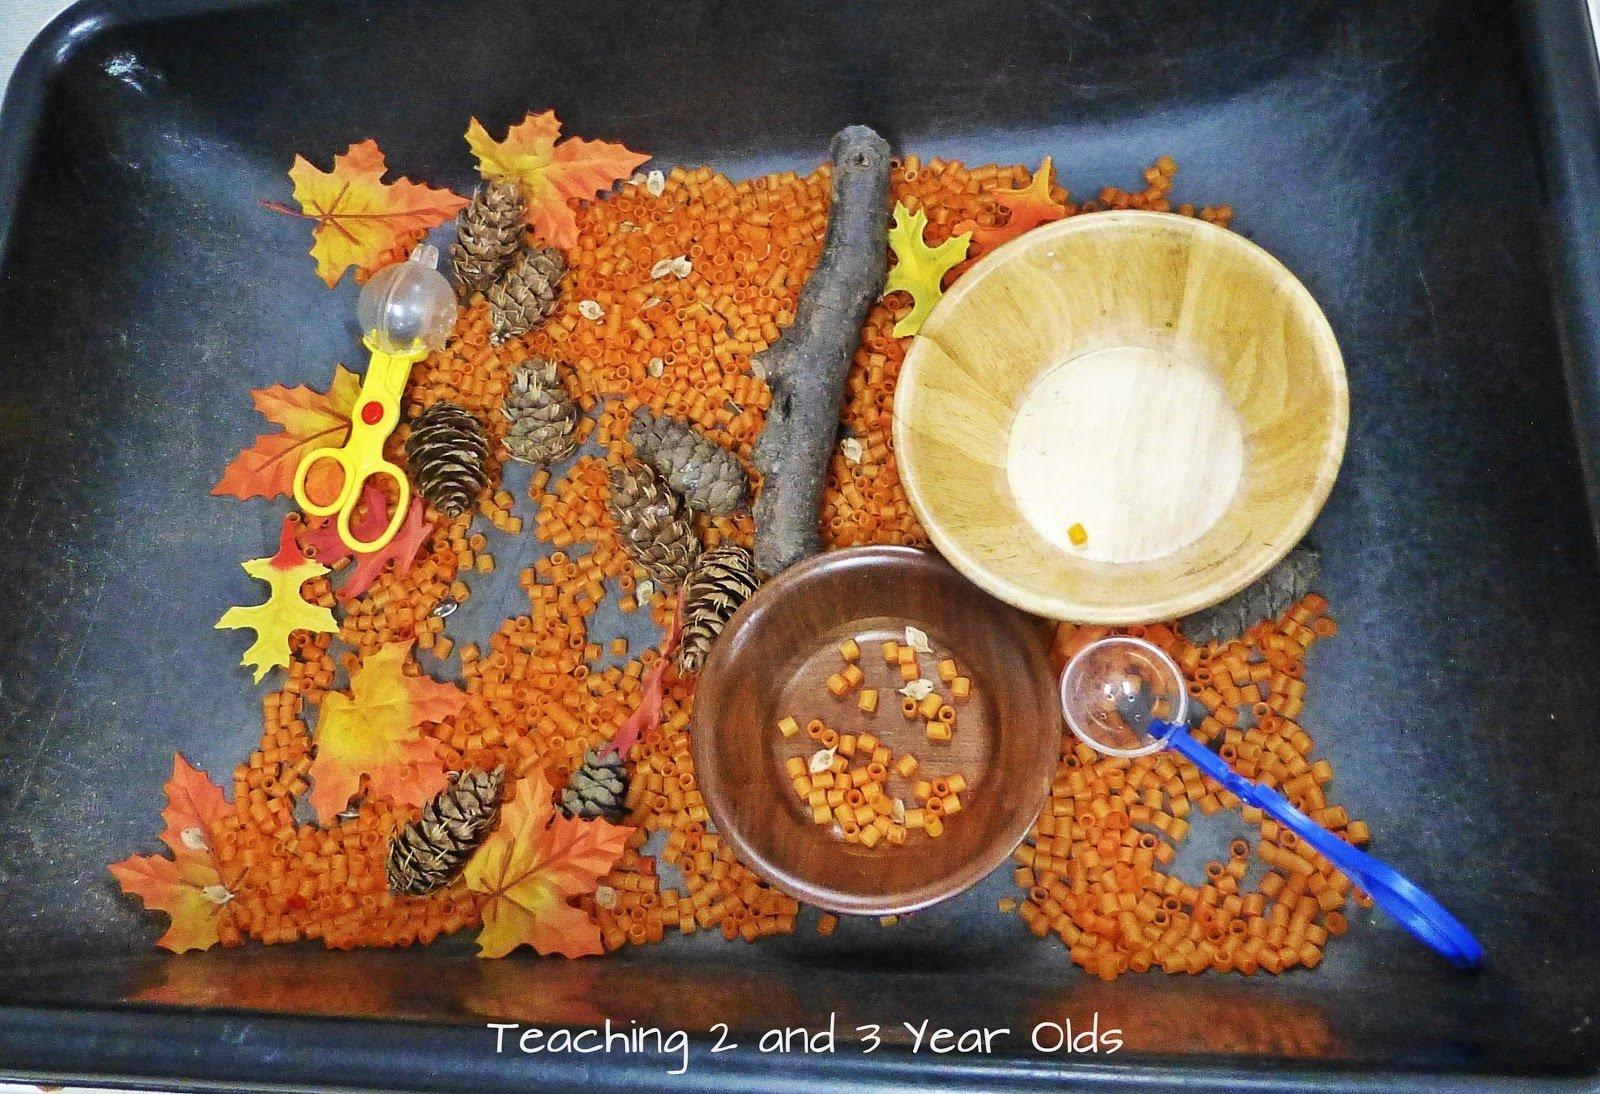 10 Nice Sensory Table Ideas For Toddlers 54 sensory table ideas for toddlers 10 sensory table ideas for